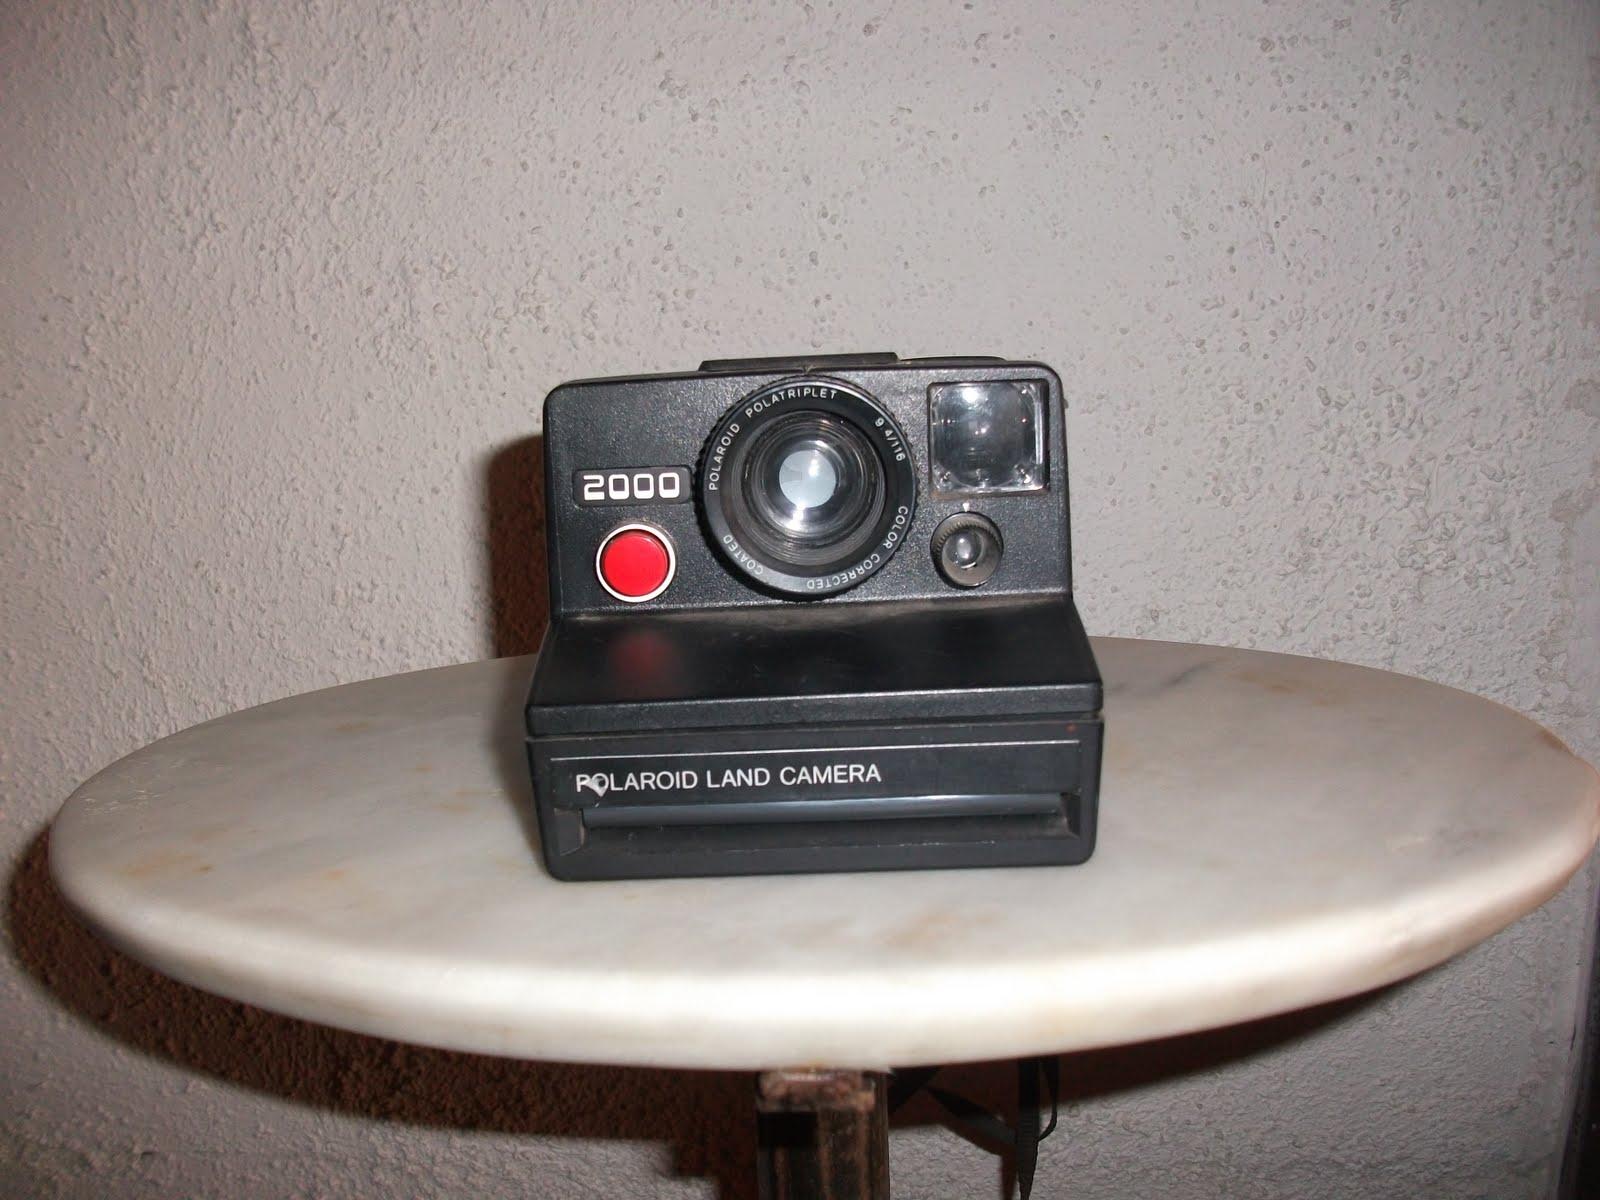 polaroid blog museo virtual polaroid land camera 2000. Black Bedroom Furniture Sets. Home Design Ideas